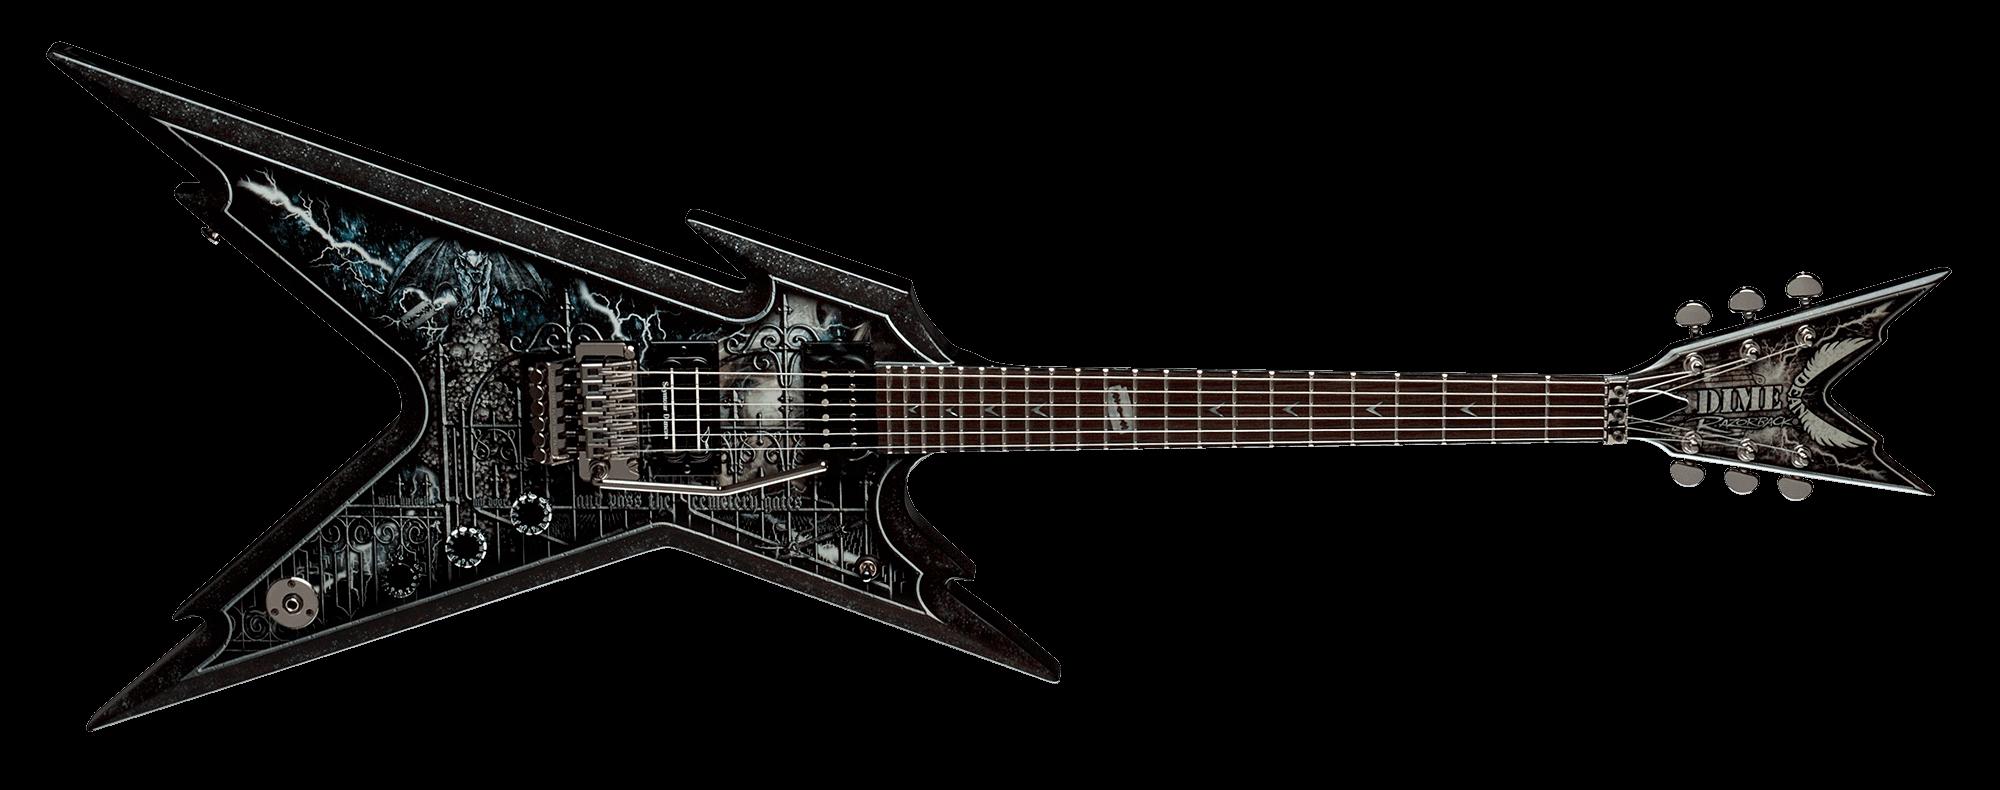 Dean Guitars Image - Cemetery Gates PNG